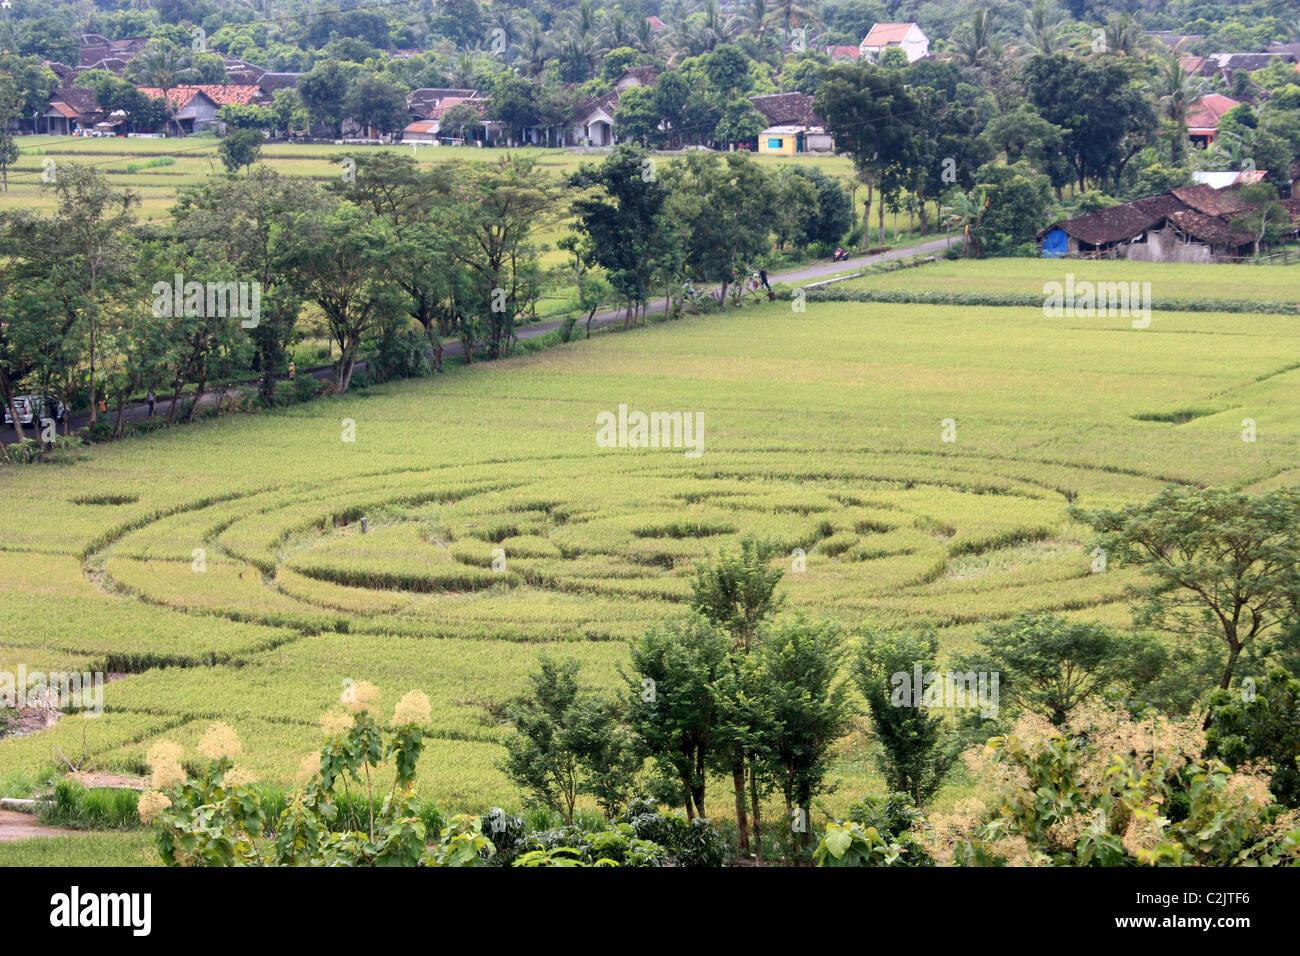 Indonesian crop circle - Stock Image